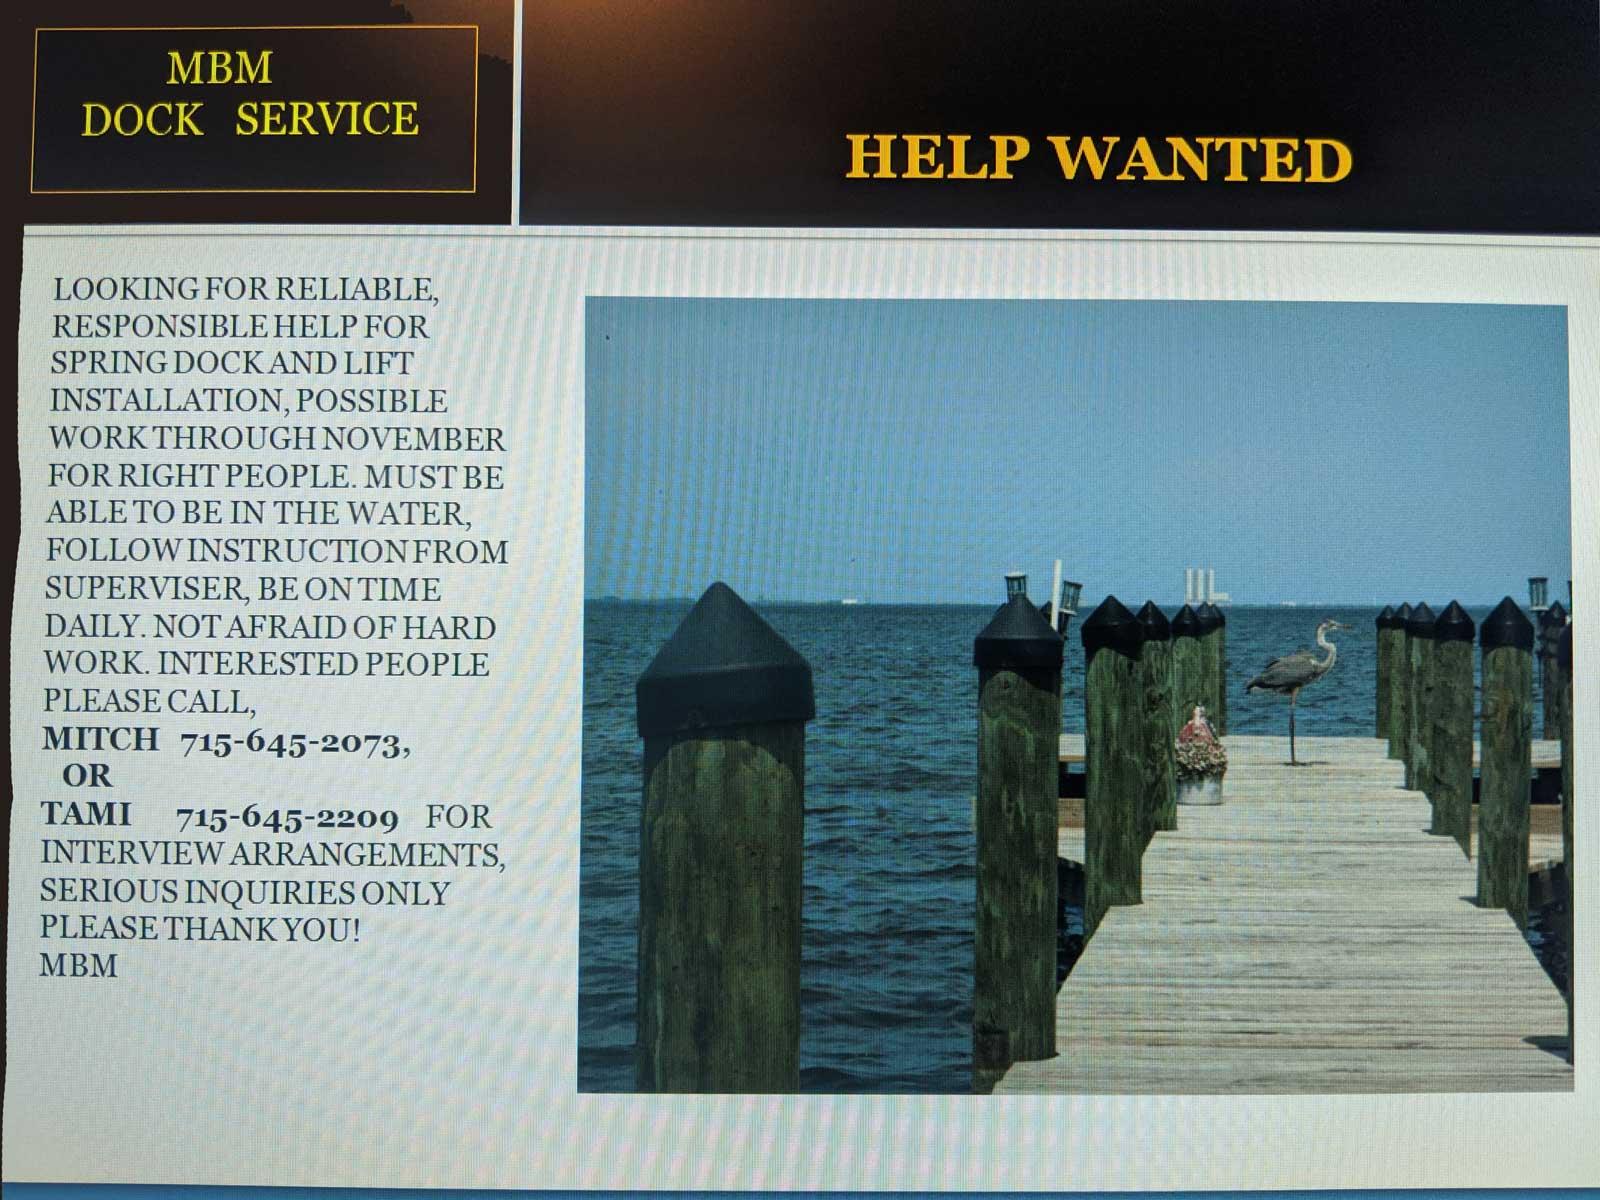 mbm dock service